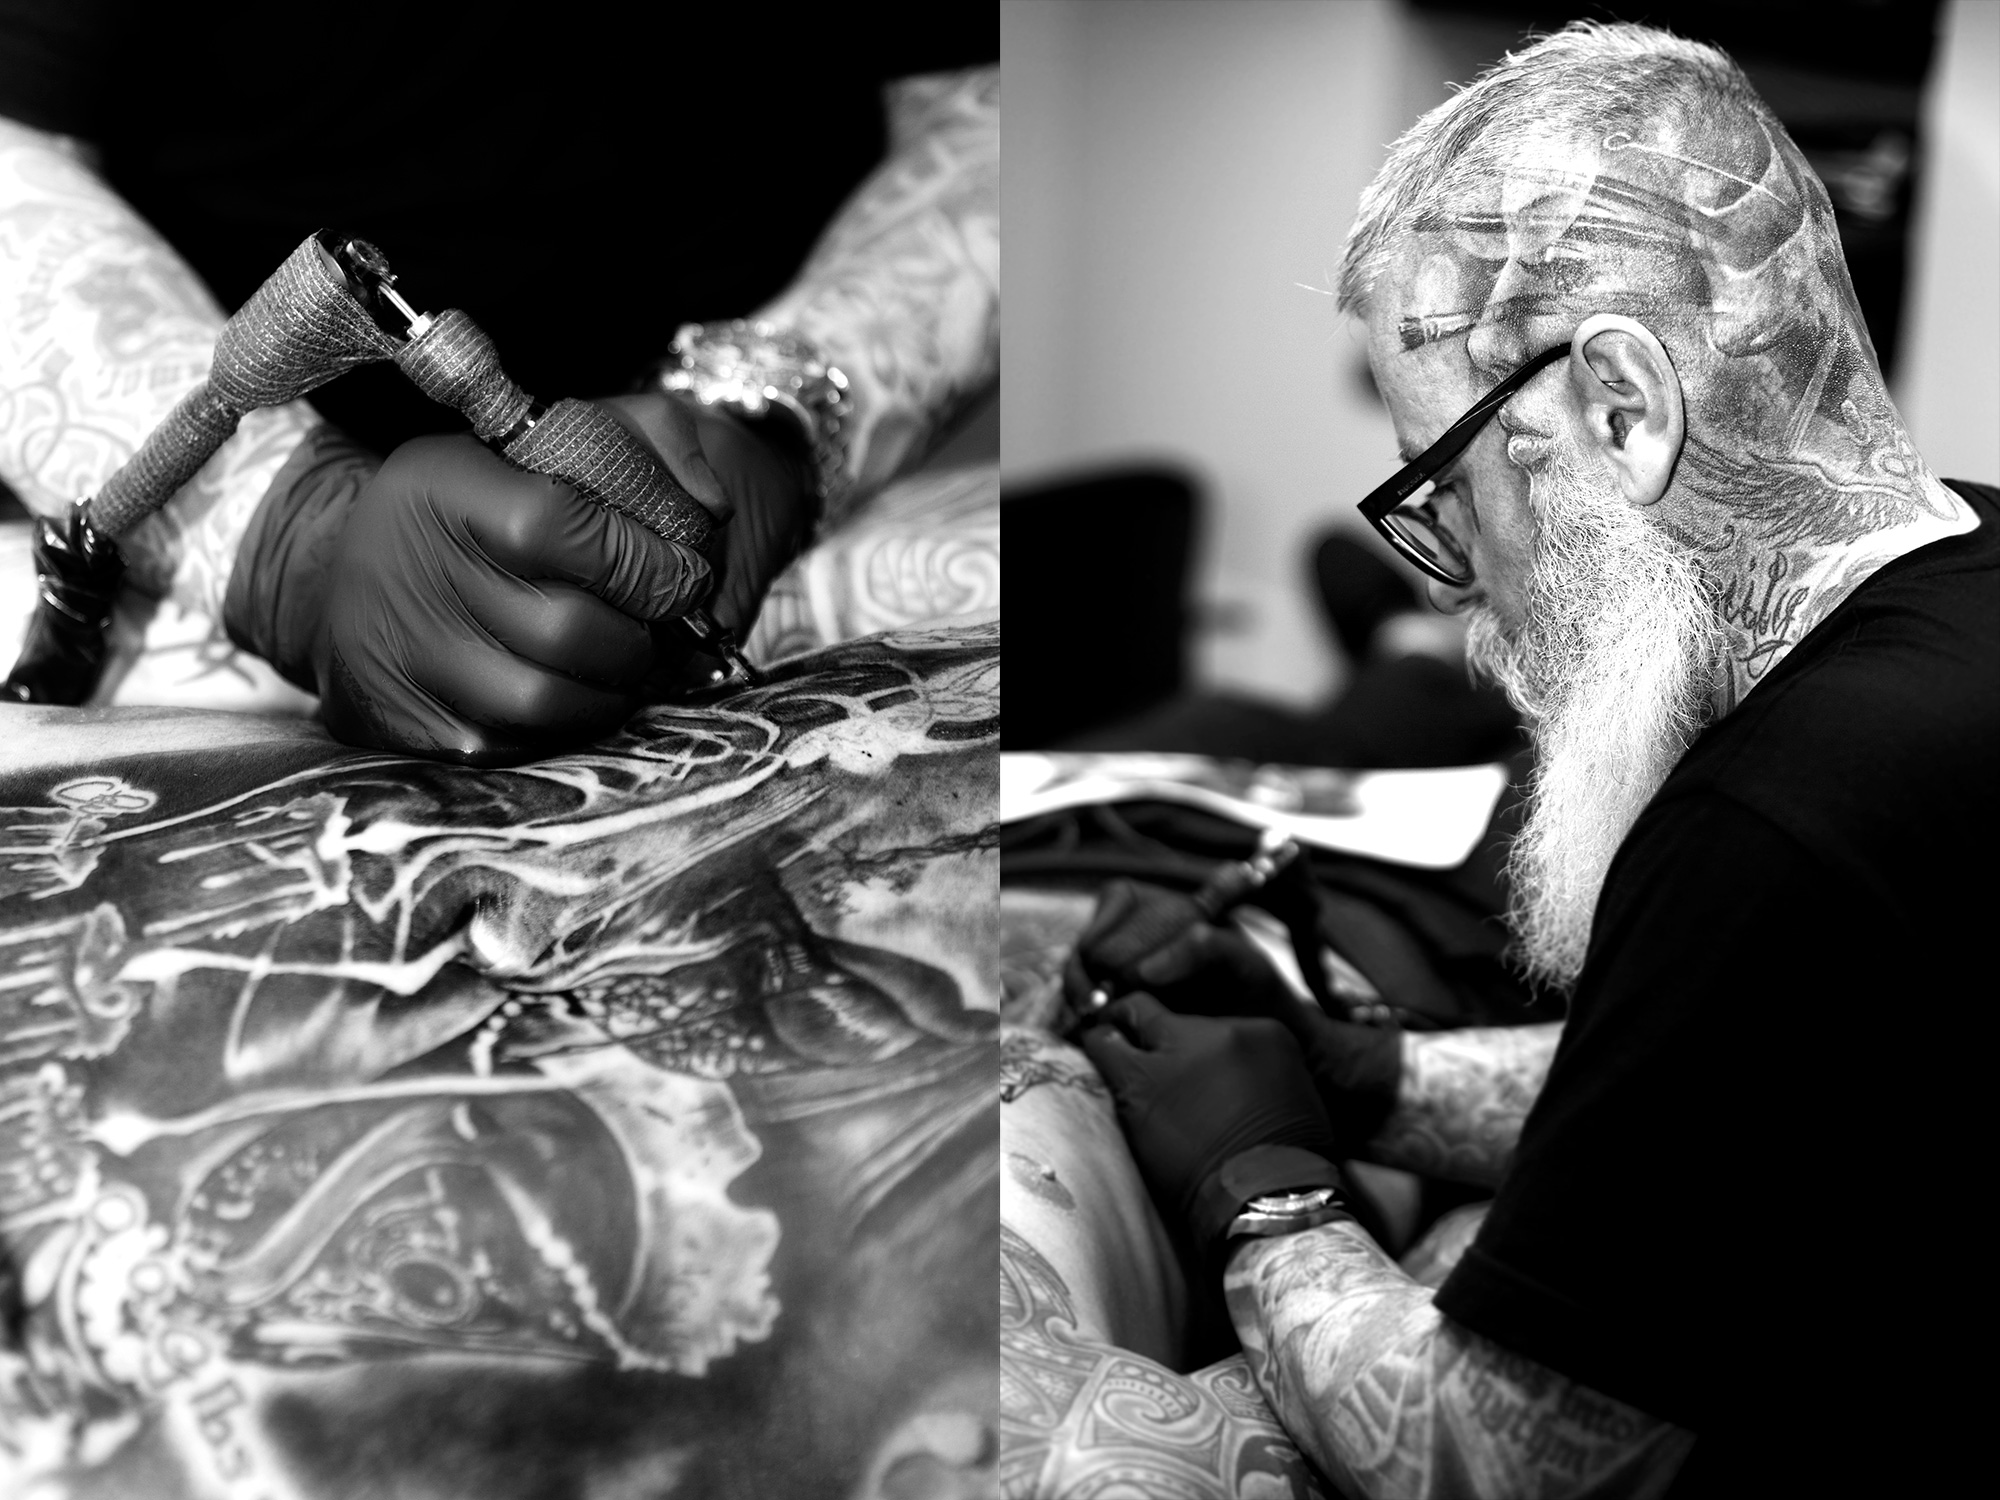 Loaf @ Yarson Tattoo Studio